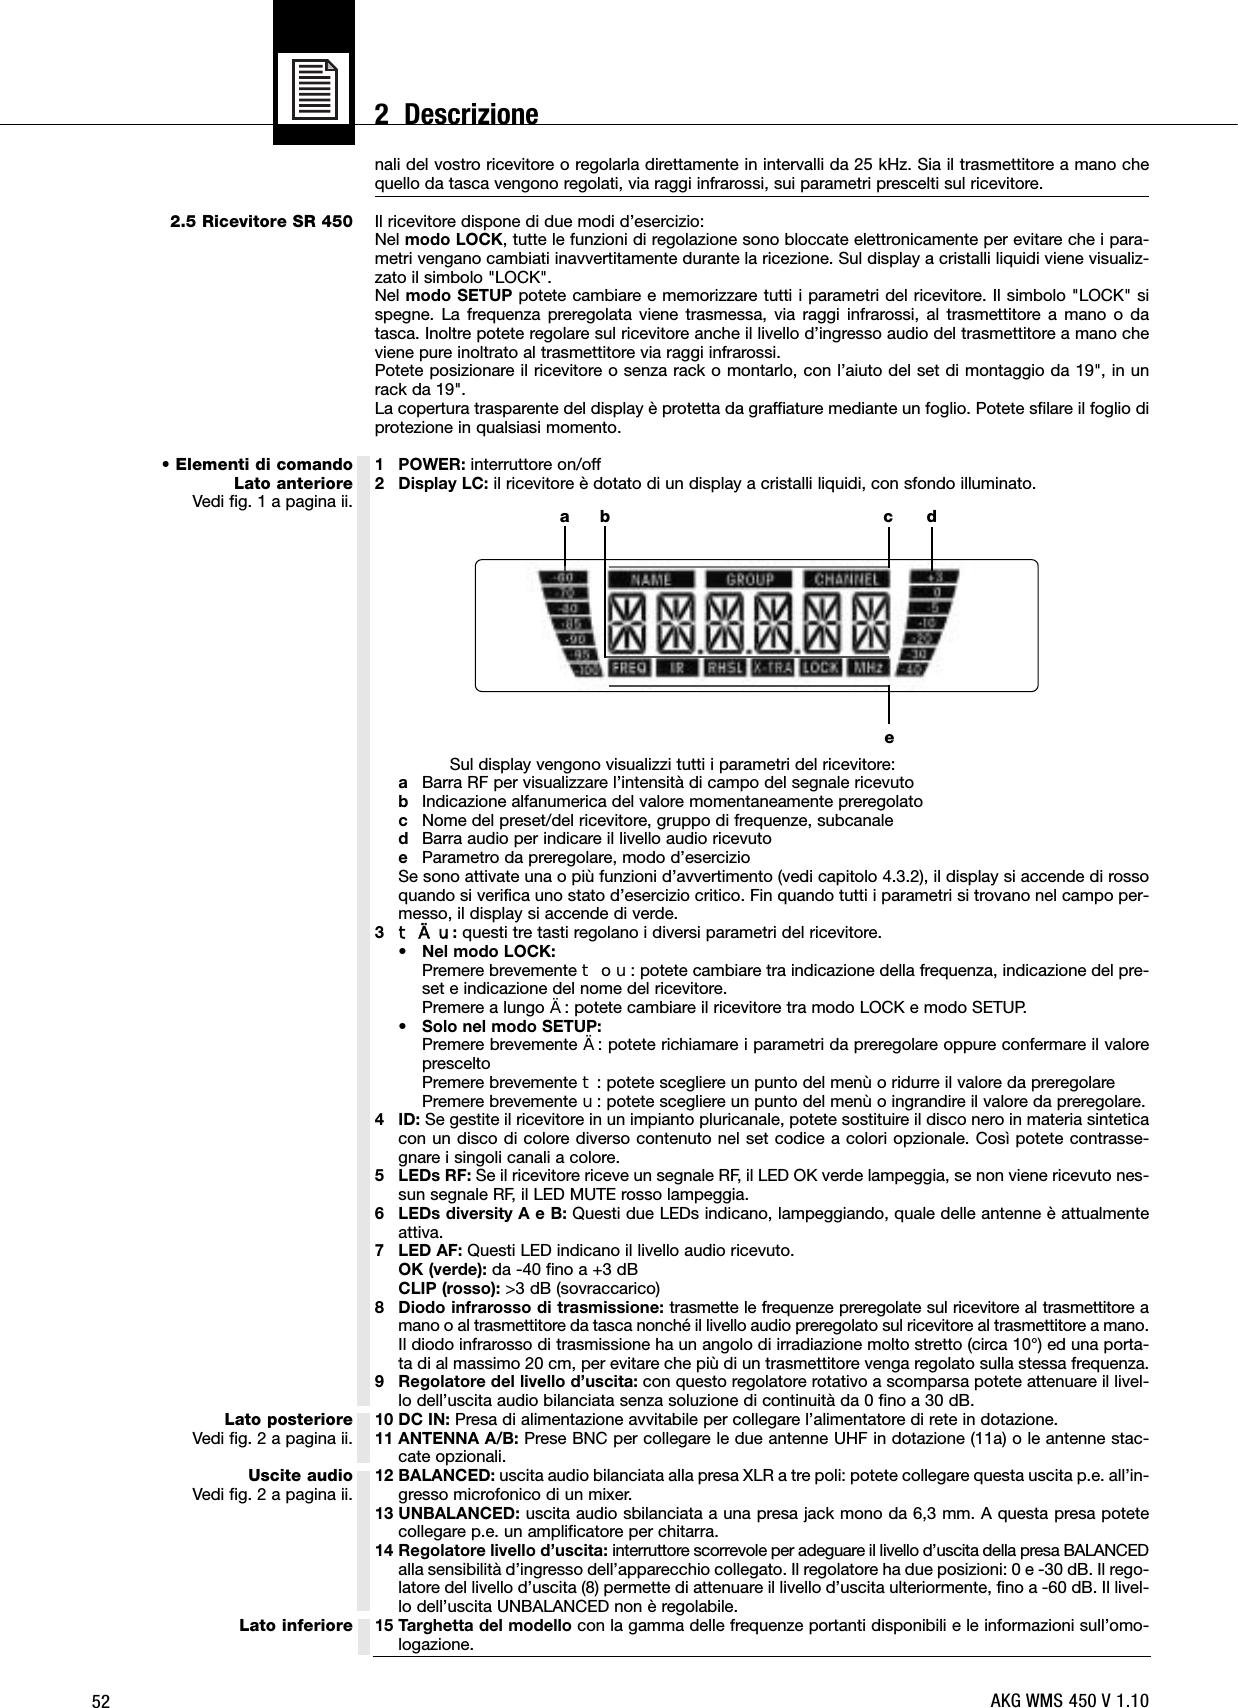 Yfz 450 Non On Headlight Manual Guide